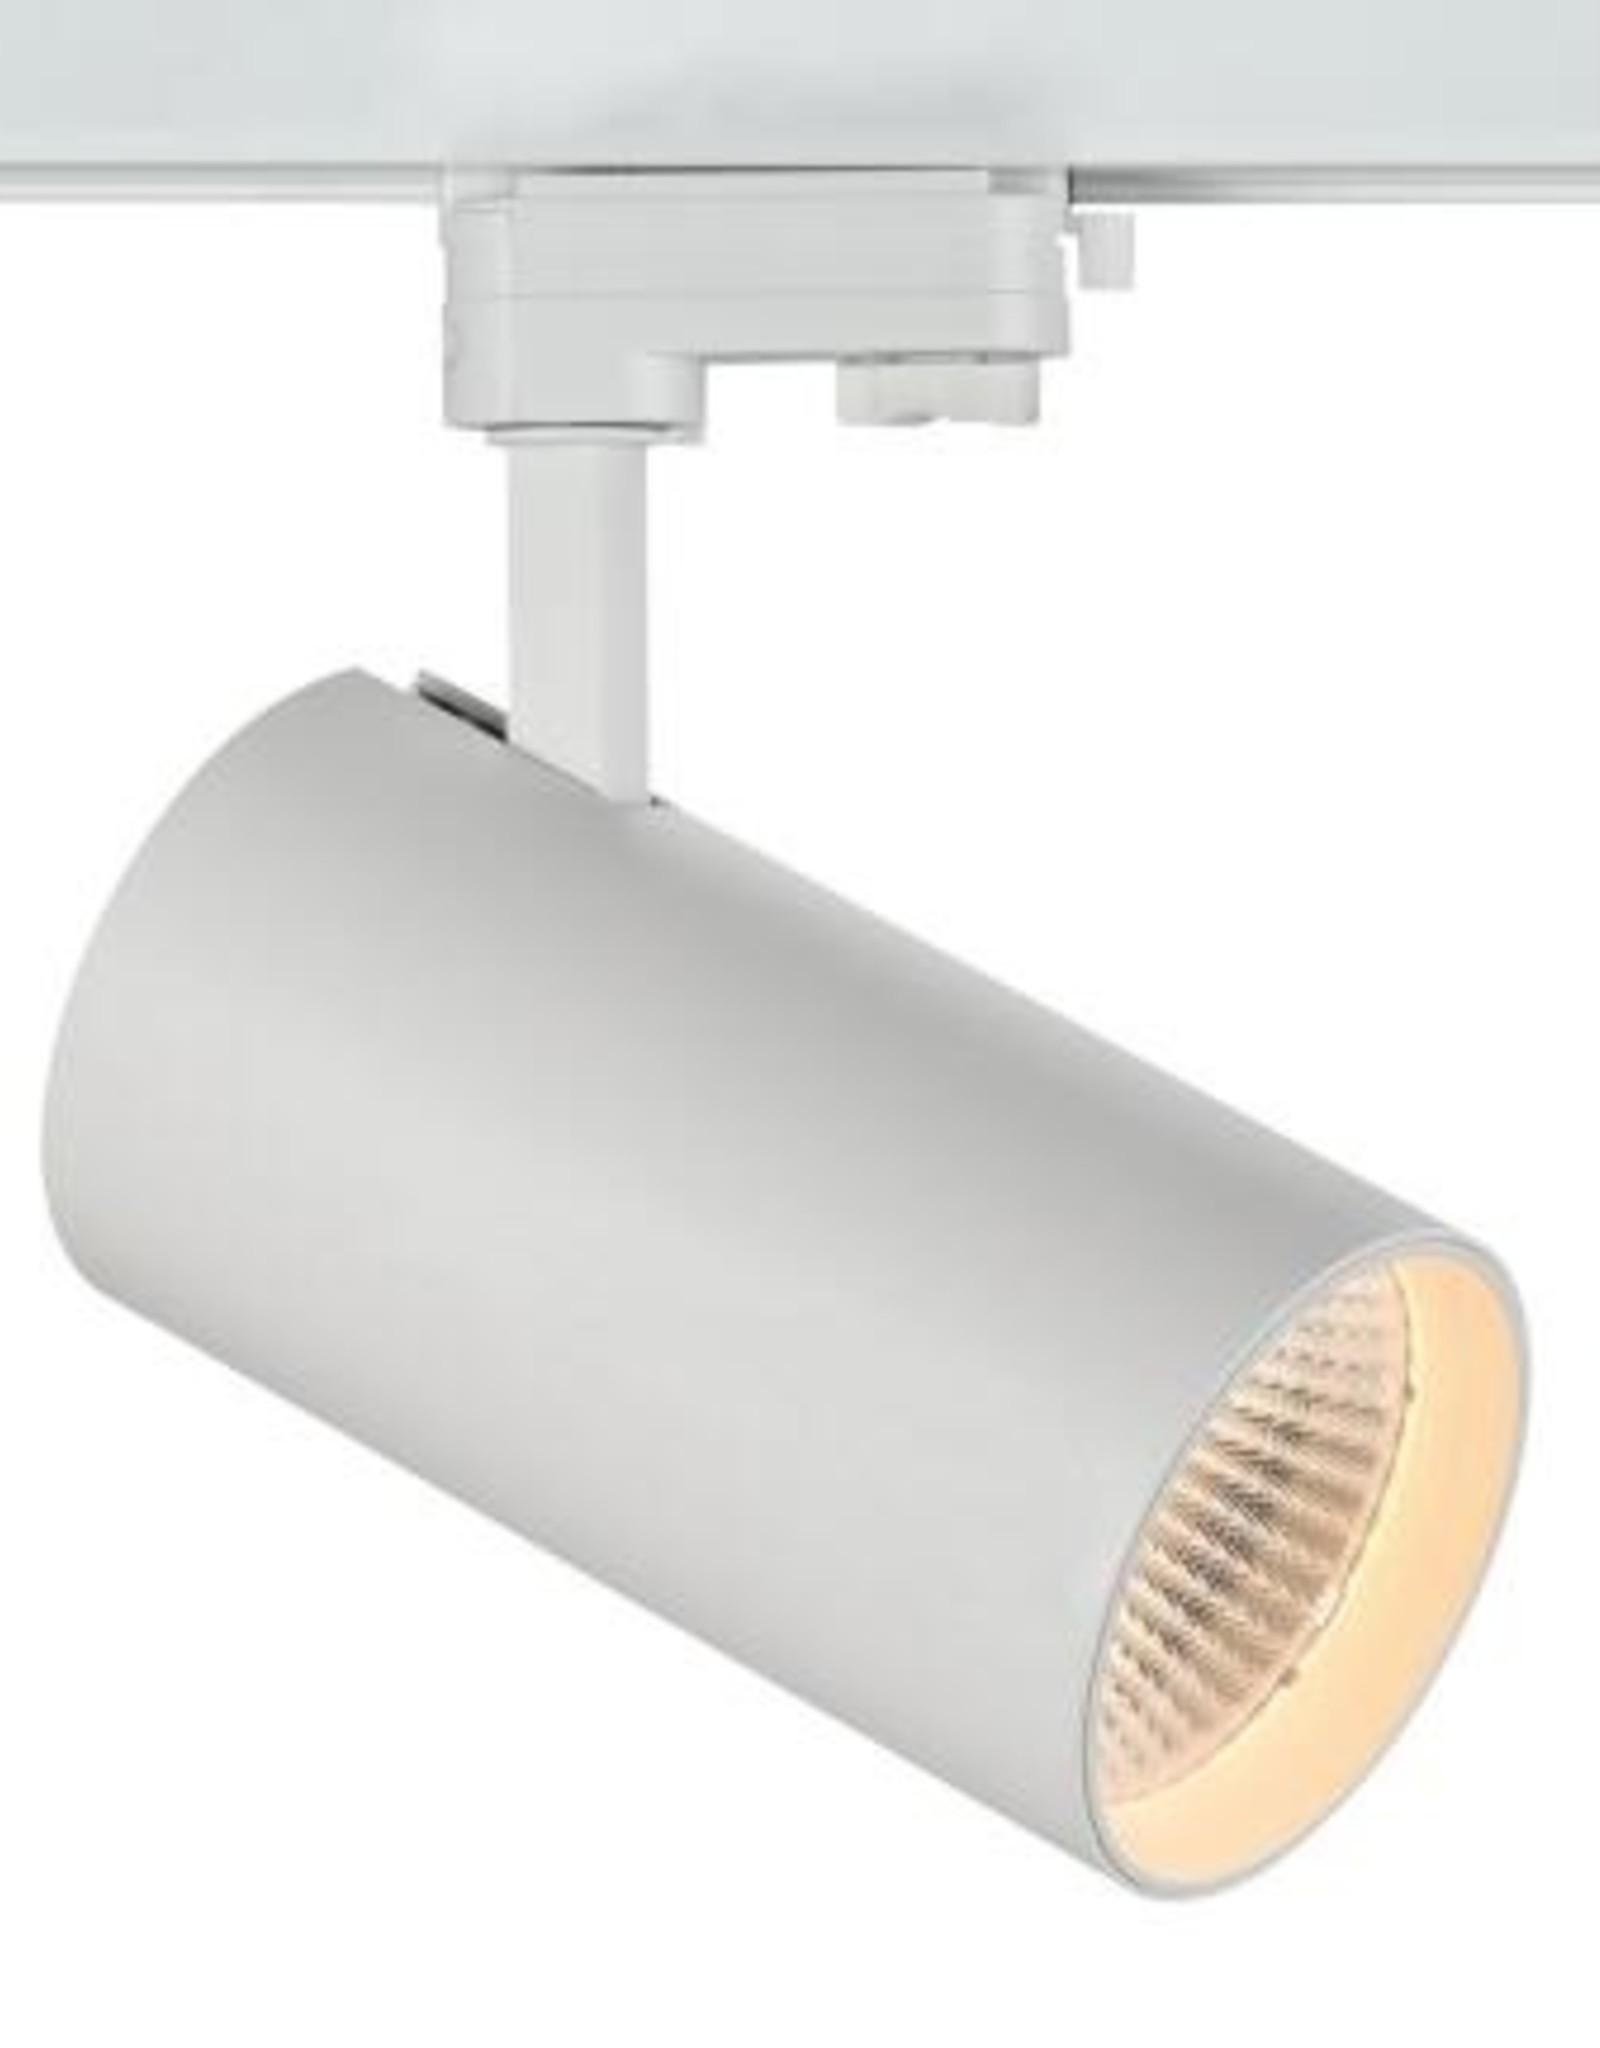 LedLed LED Tracklight 45W 2700k